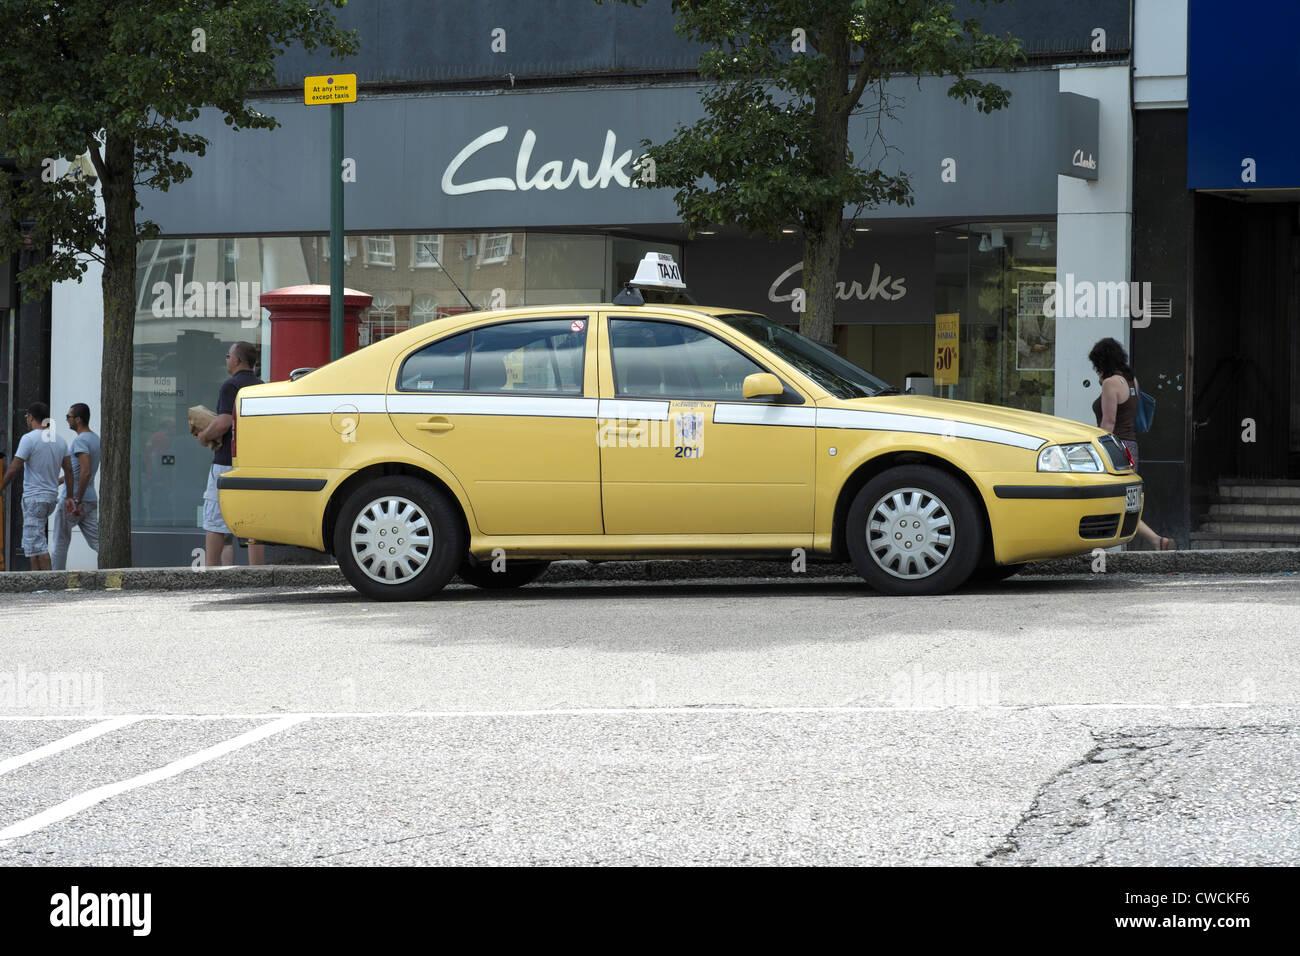 Yellow Skoda Taxi Cab In Bournemouth Stock Photo 50065882 Alamy